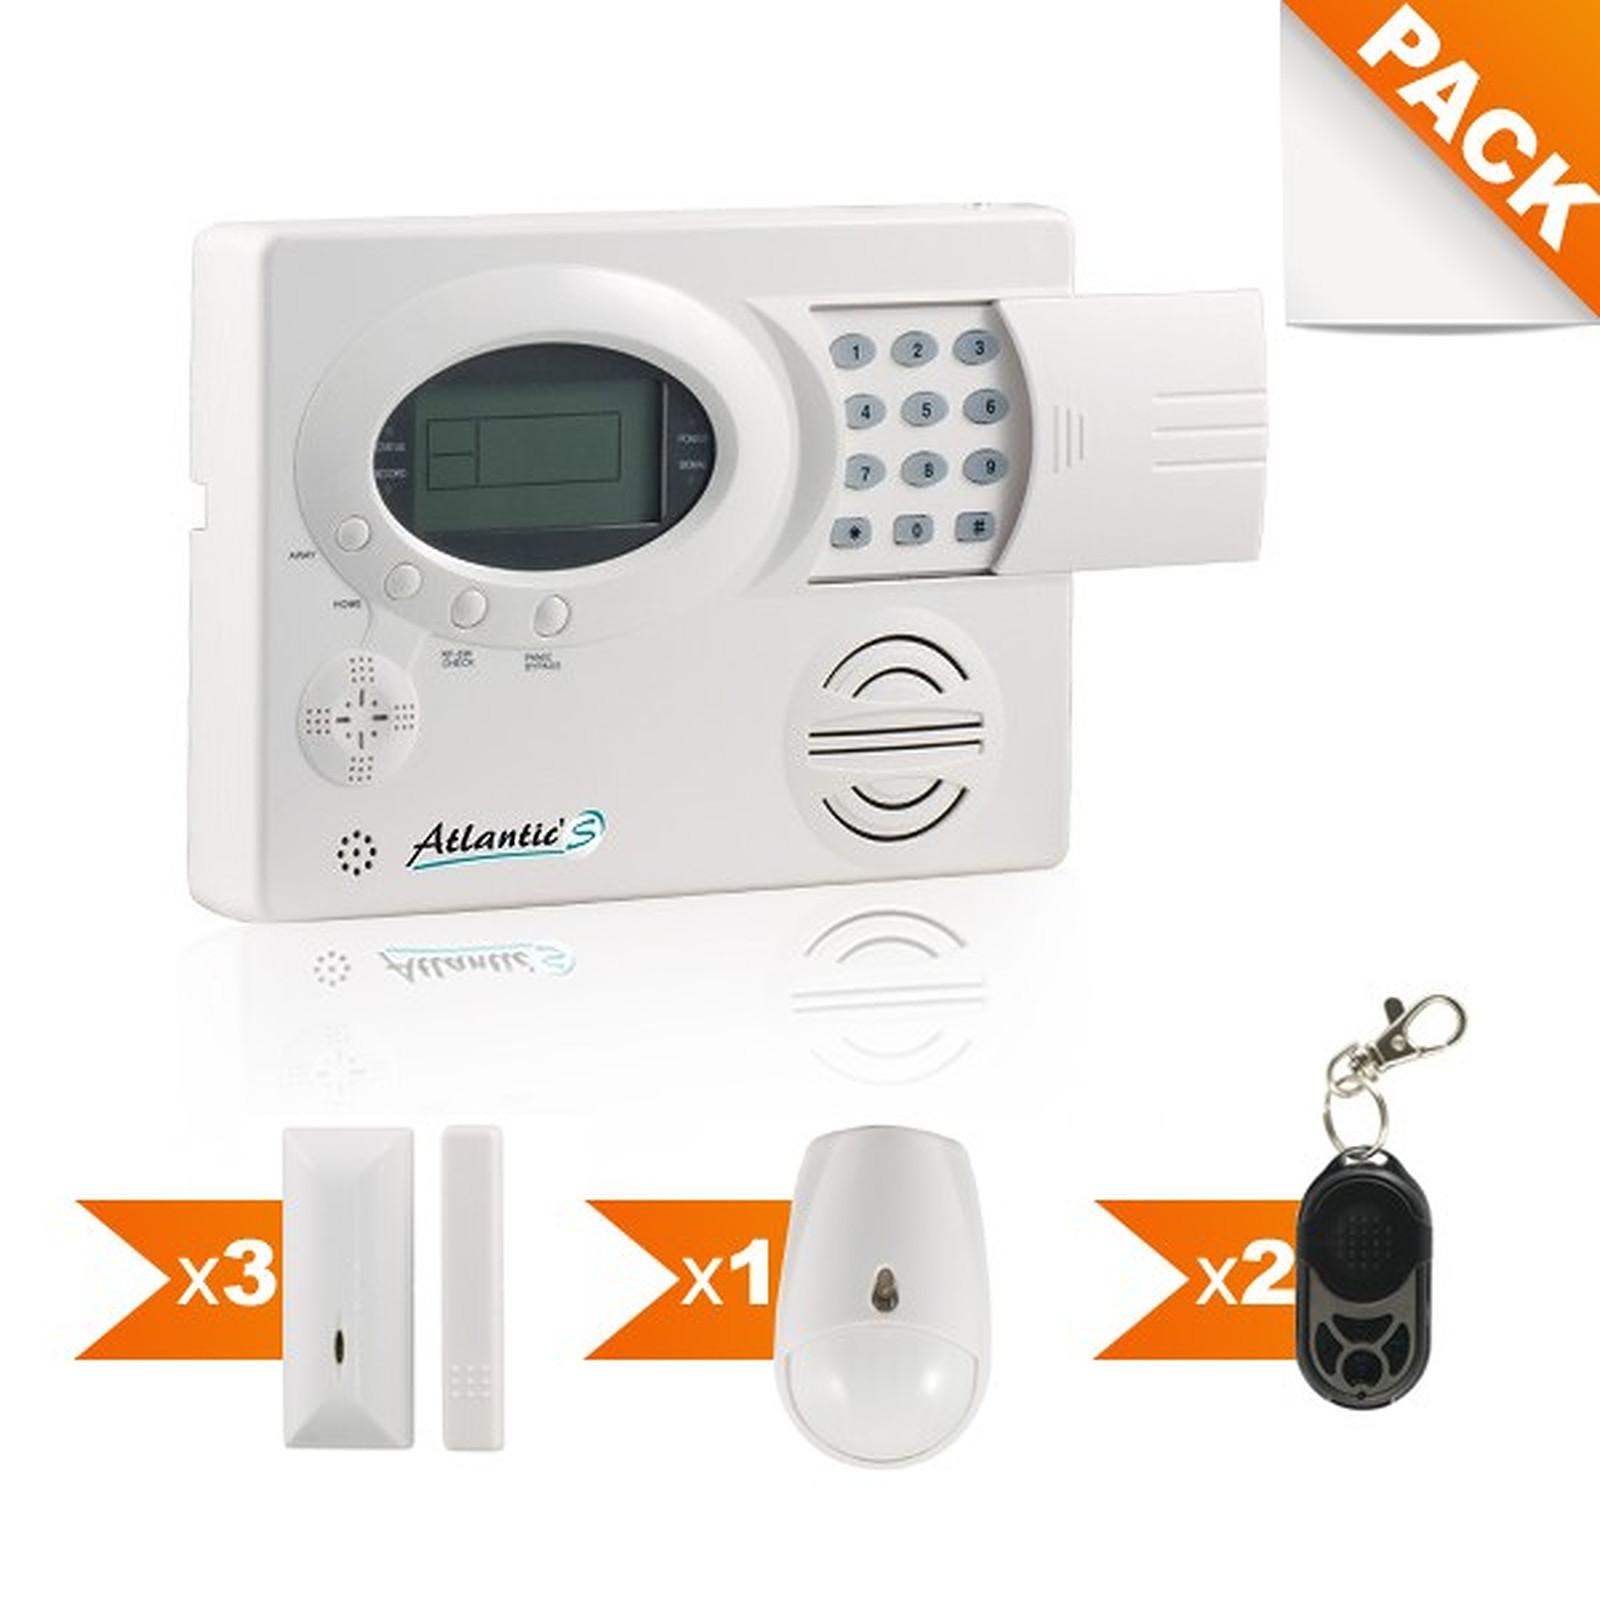 Atlantic'S Pack alarme sans fil Kit 2